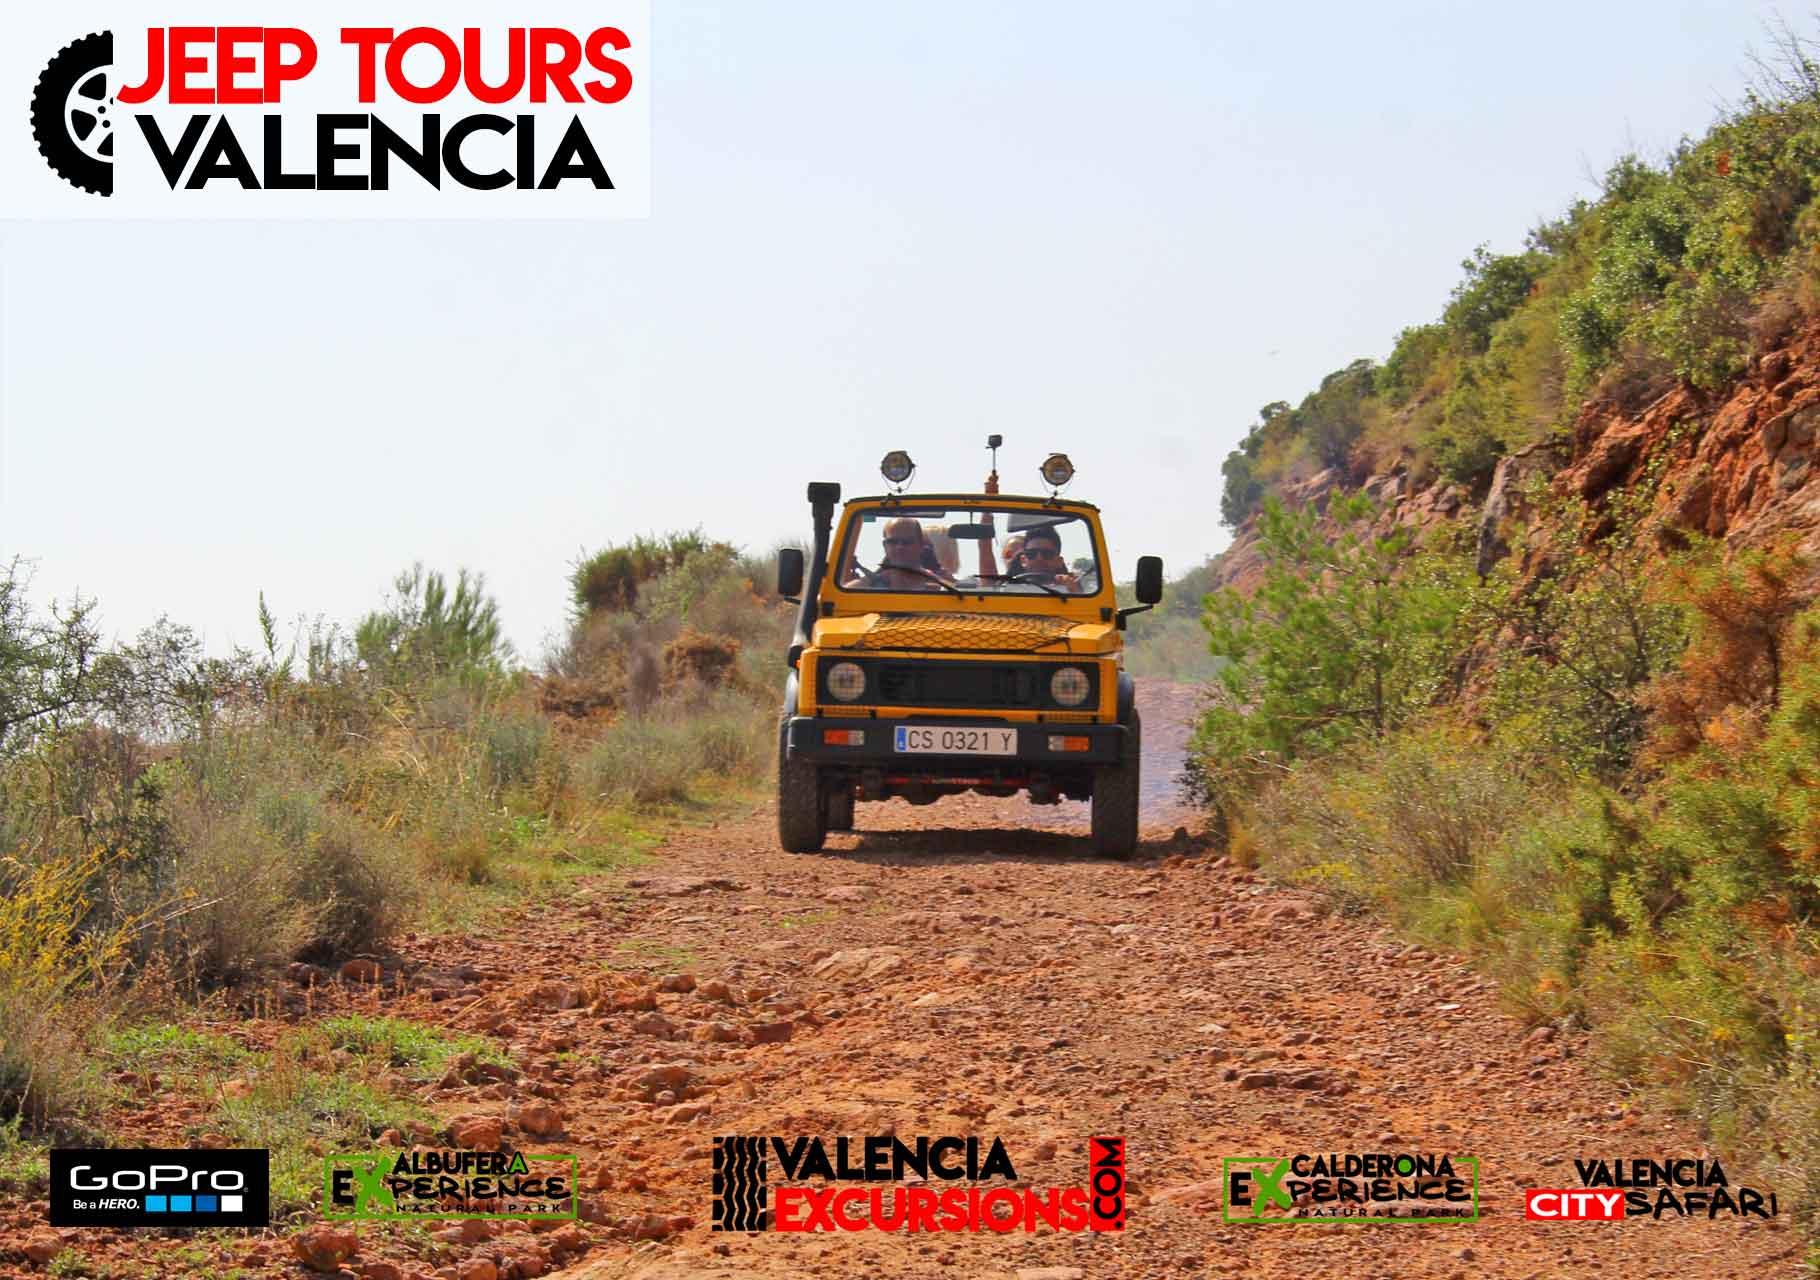 Jeep Tour in Valencia. Fahre selber in 4x4 Jeeps durch den Calderona National Park in Valencia. Abenteuer und Natur in Valencia